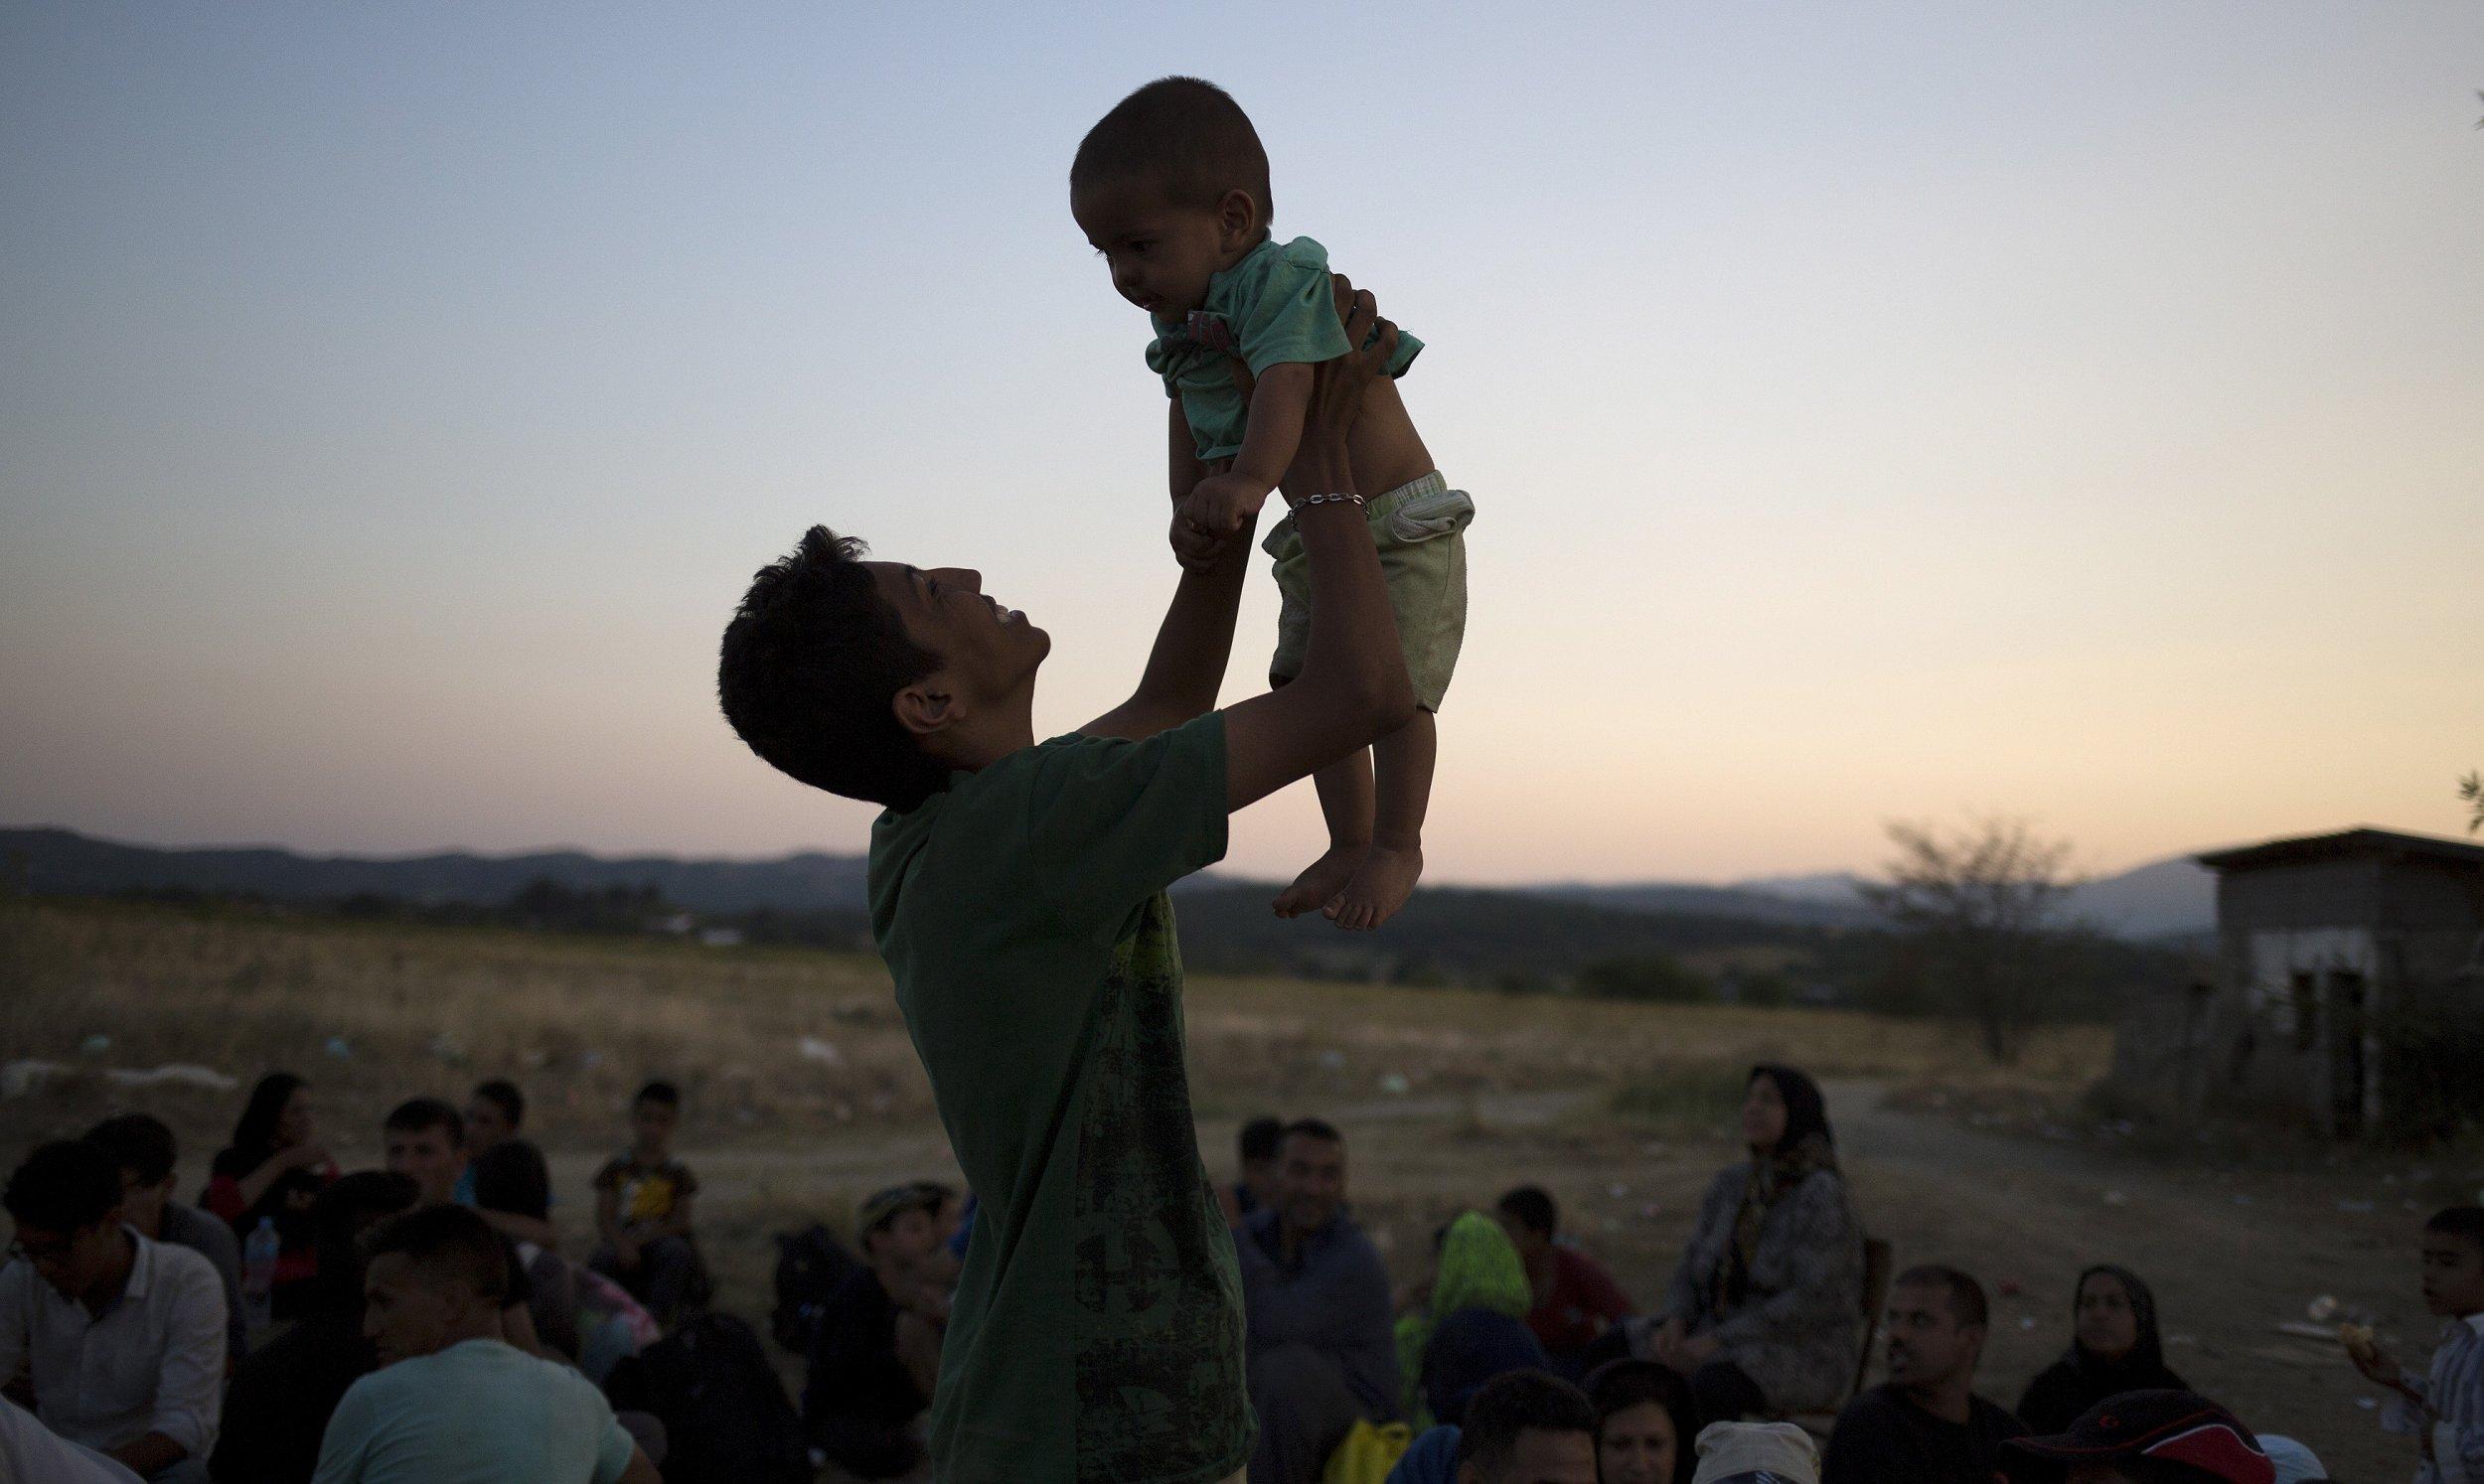 9/7 Afghanistan Refugees Europe